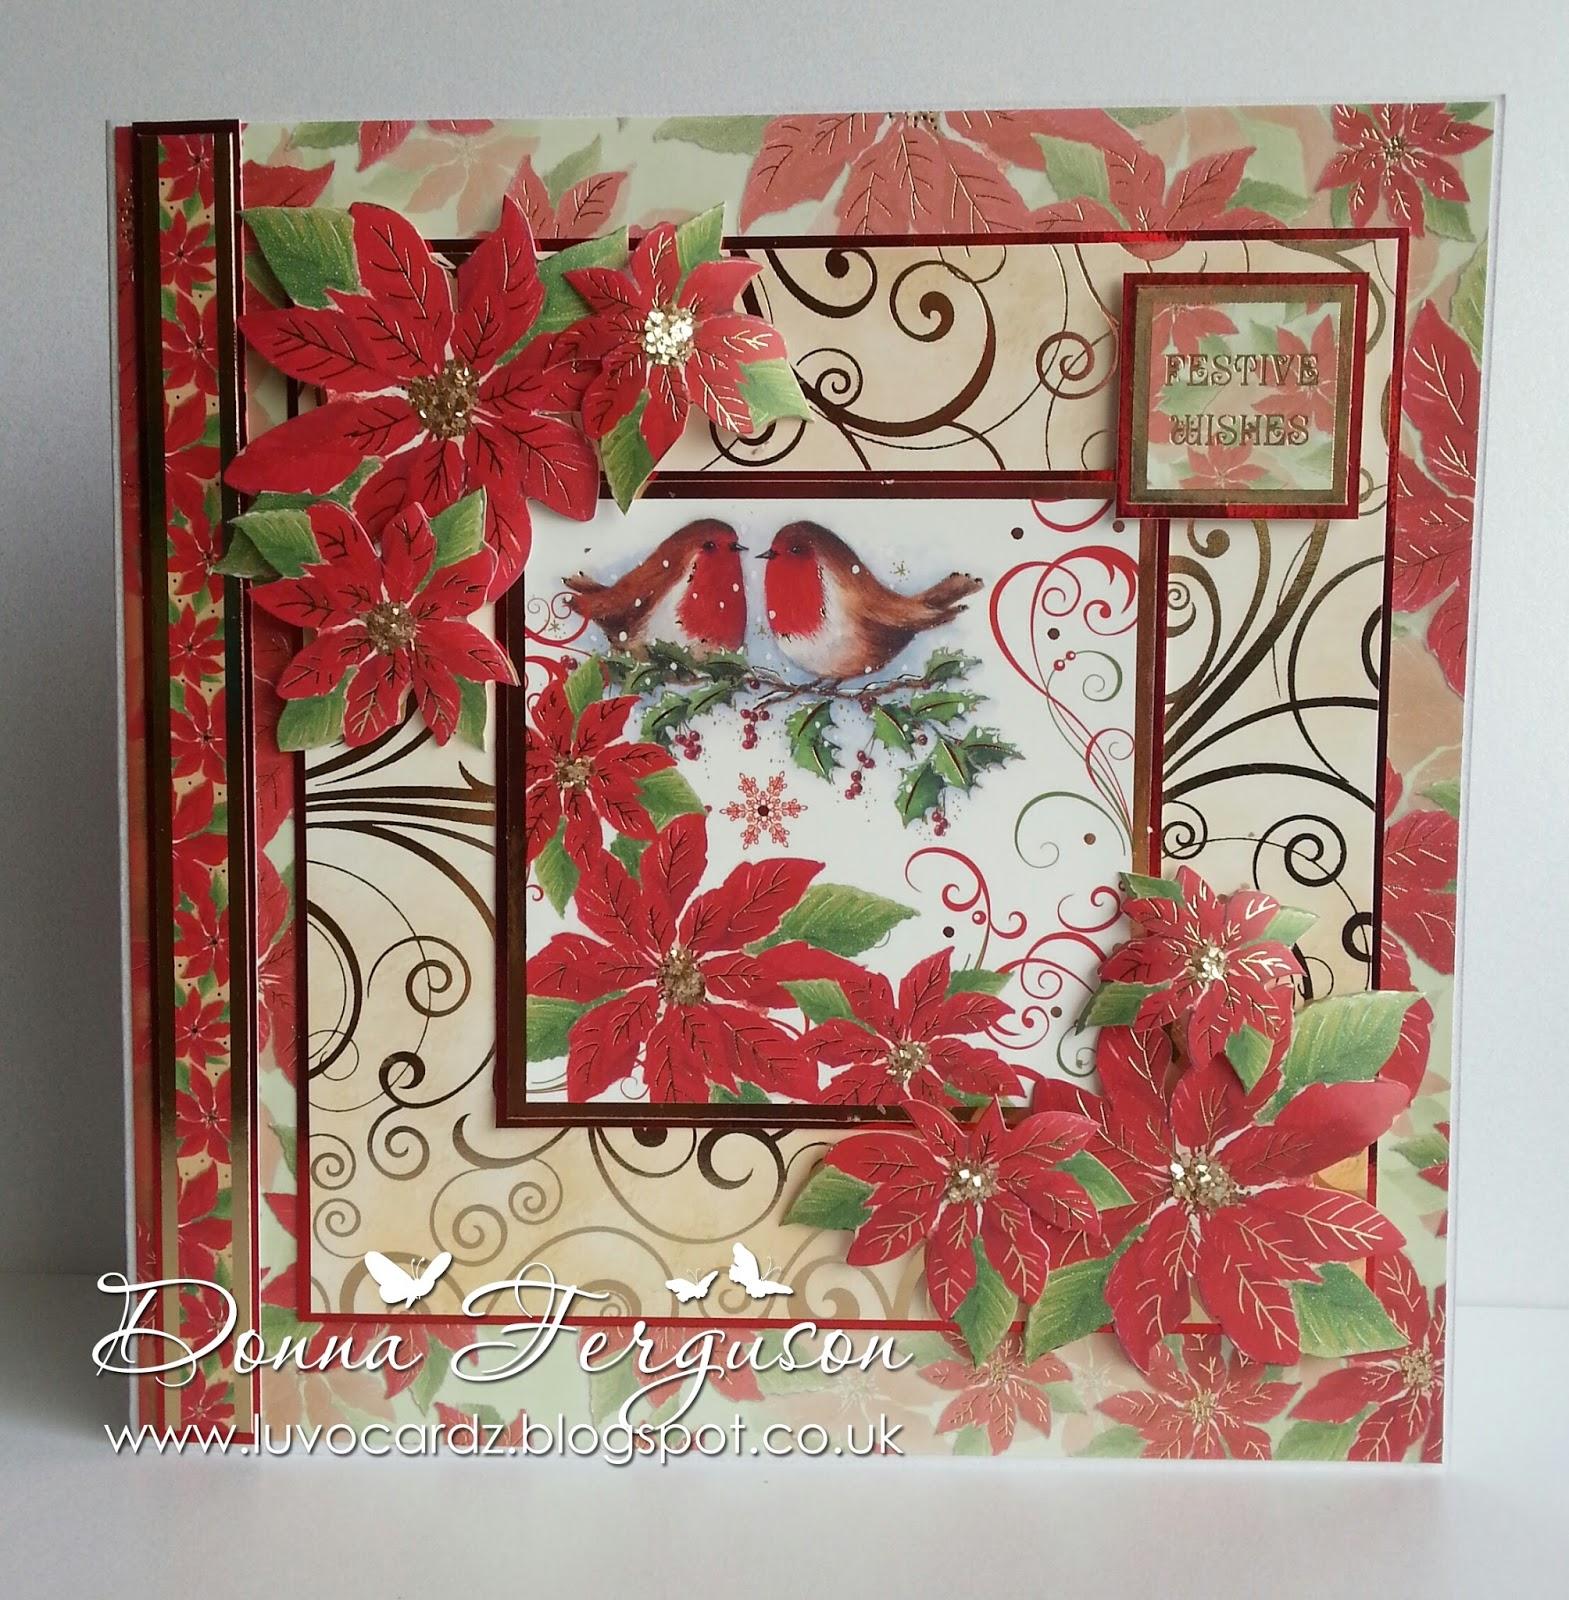 Handmade With Love in N.I.: Hunkydory Traditional Christmas Sneak Peaks